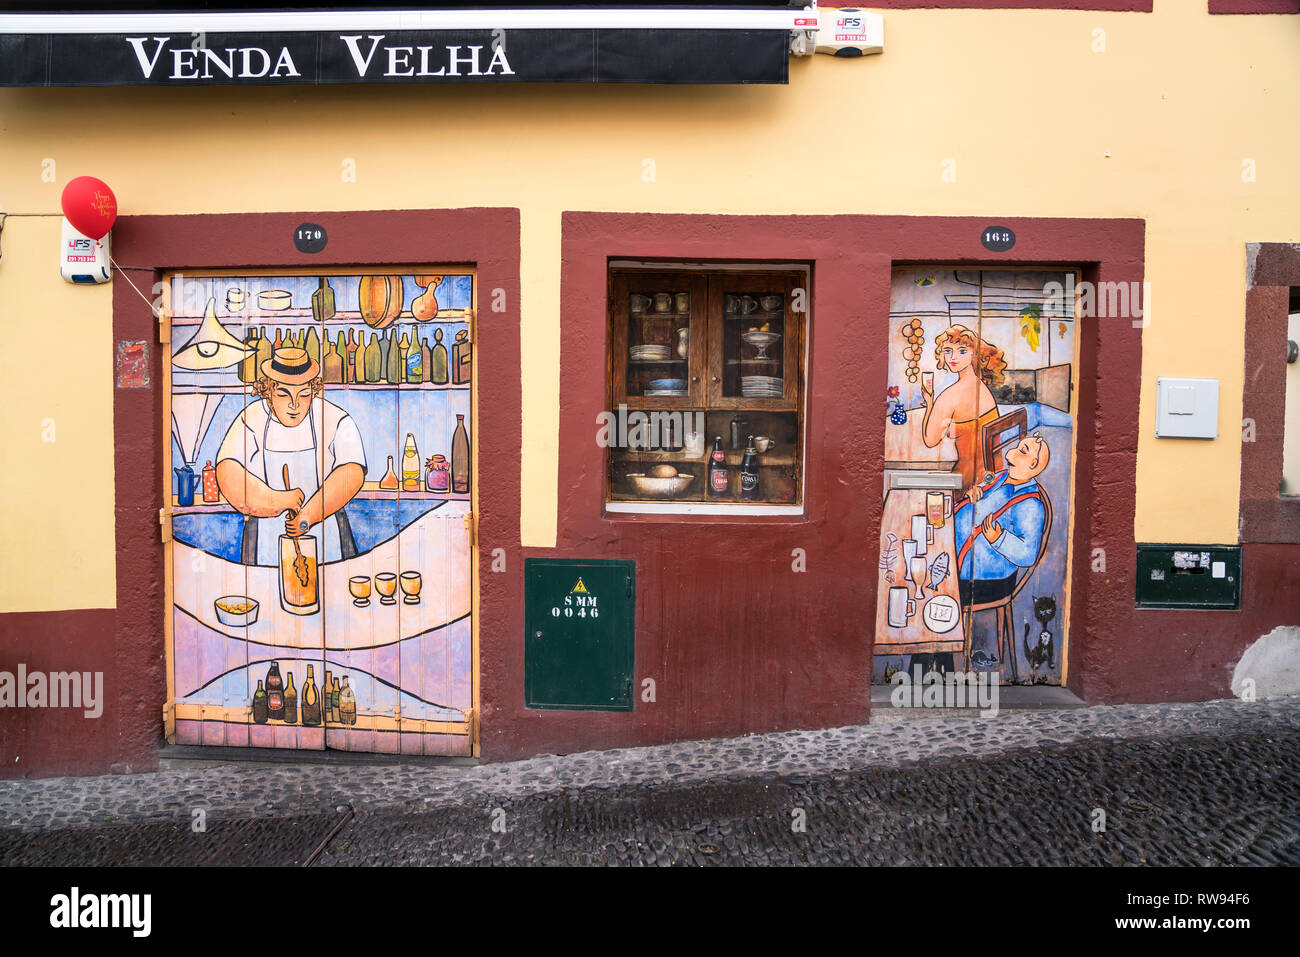 Kunstprojekt mit bemalten Türen in der Altstadt von Funchal, Madeira, Portugal, Europa    Art project Painted doors in Funchal, Madeira, Portugal, Eur - Stock Image